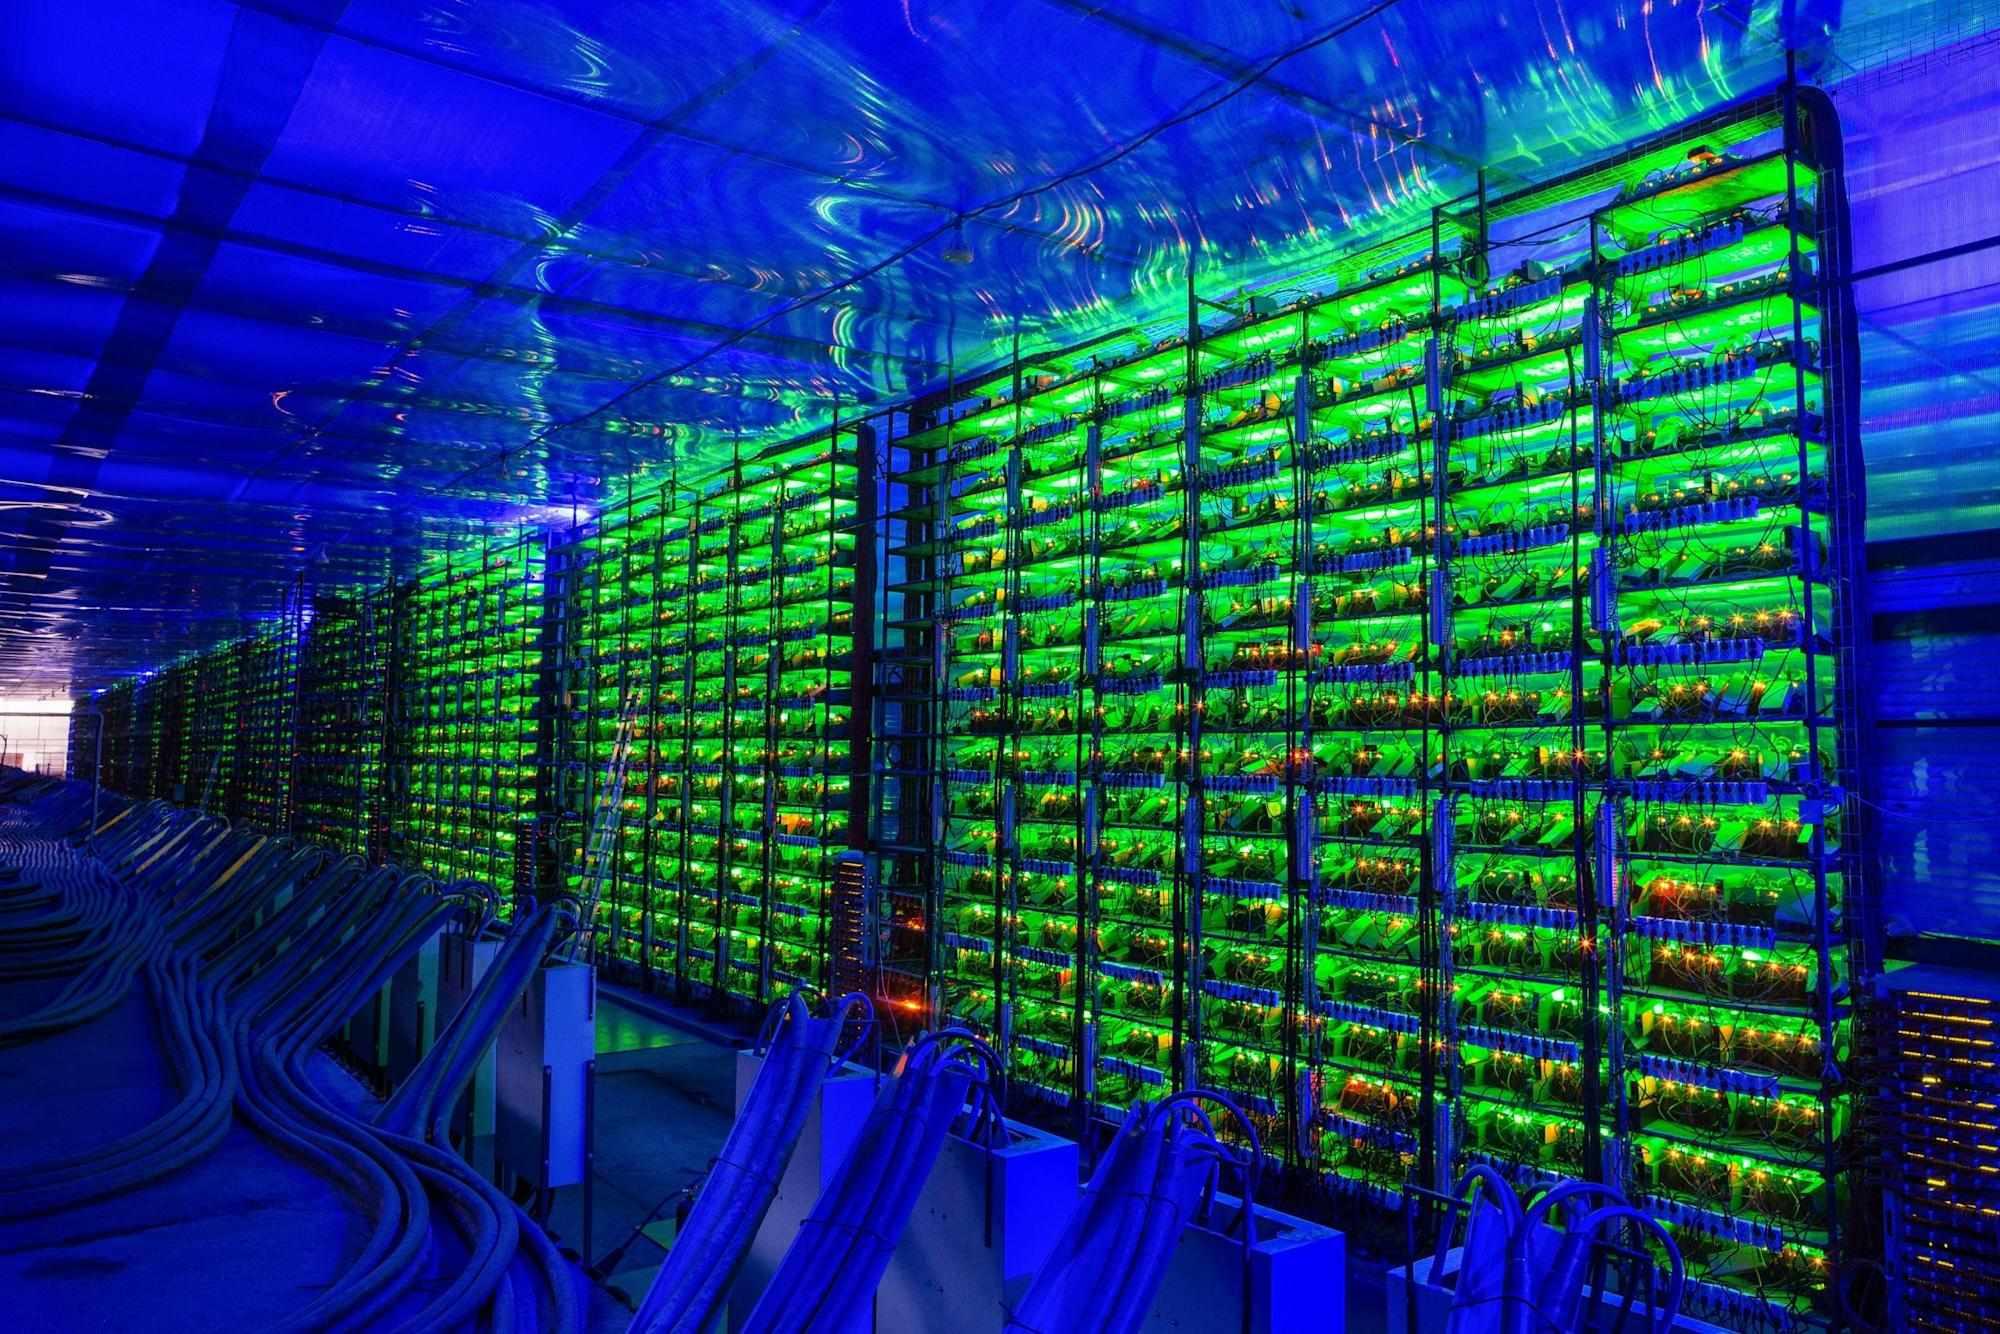 marathon patent mined bitcoin sees